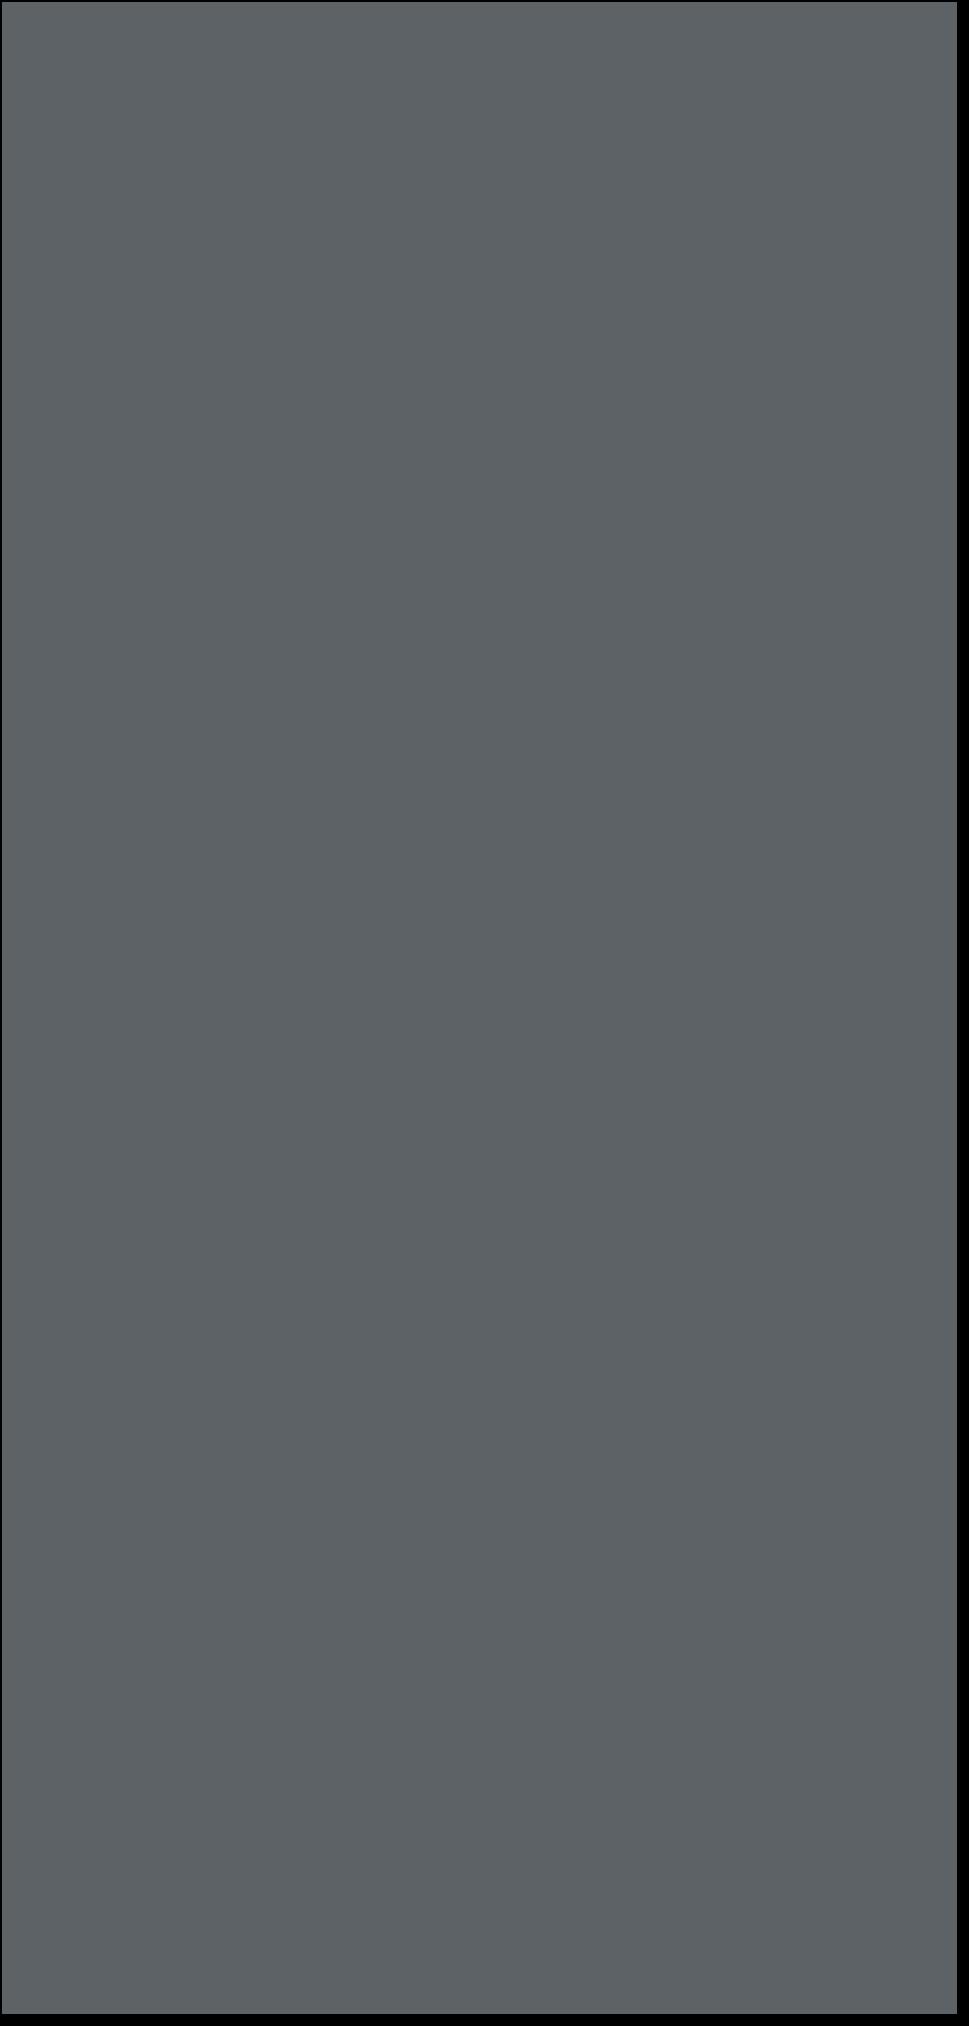 kleincontainerdienst sulzberger. Black Bedroom Furniture Sets. Home Design Ideas